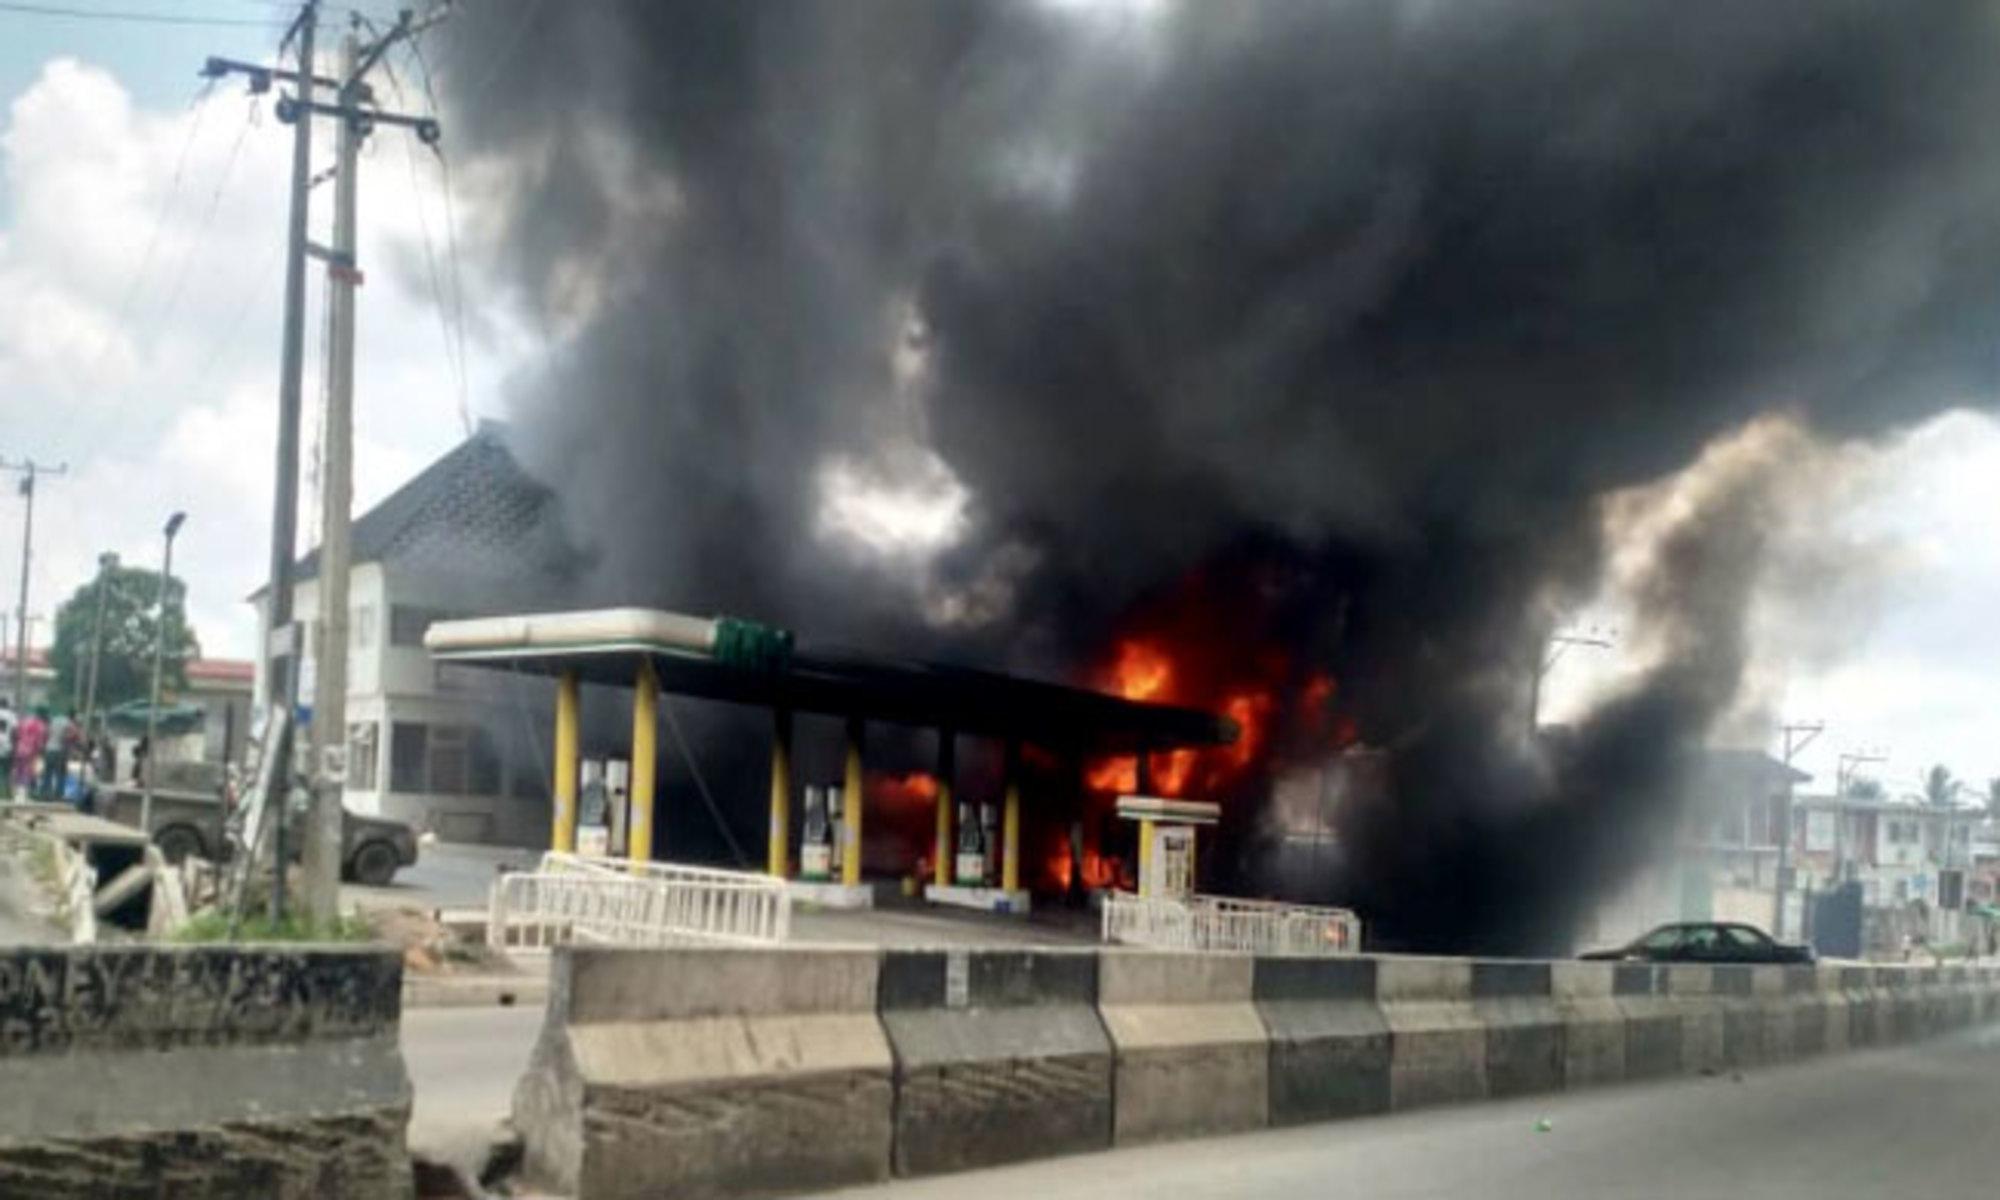 NNPC Ogba Station on fire